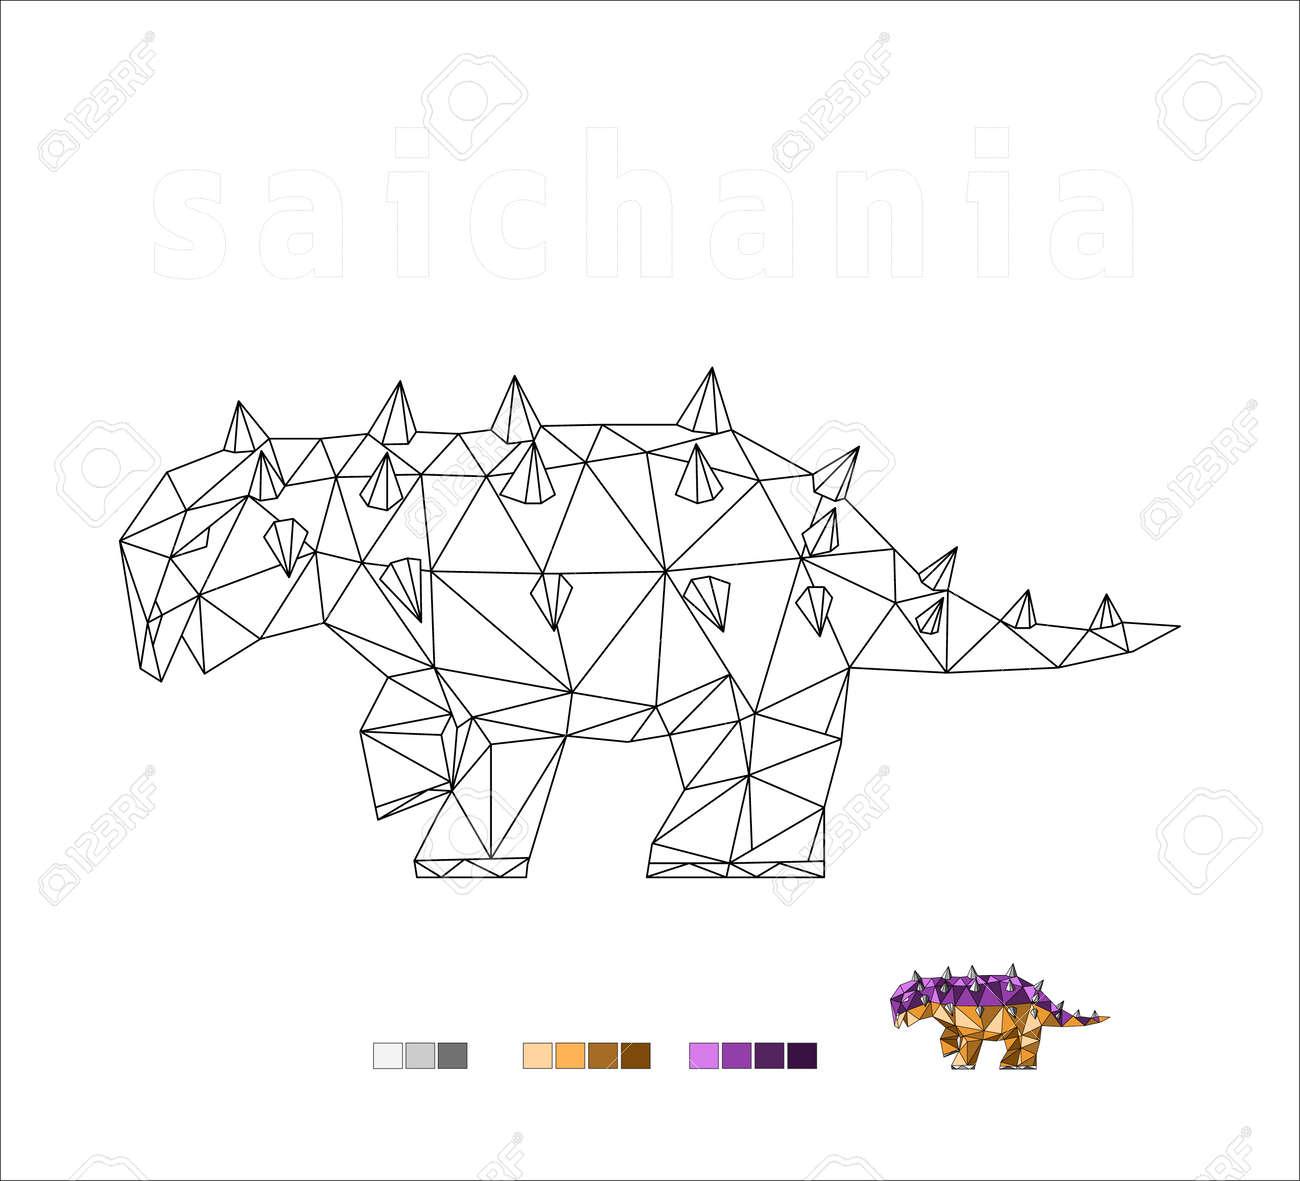 dinosaur coloring species saichania art vector illustration - 170755626